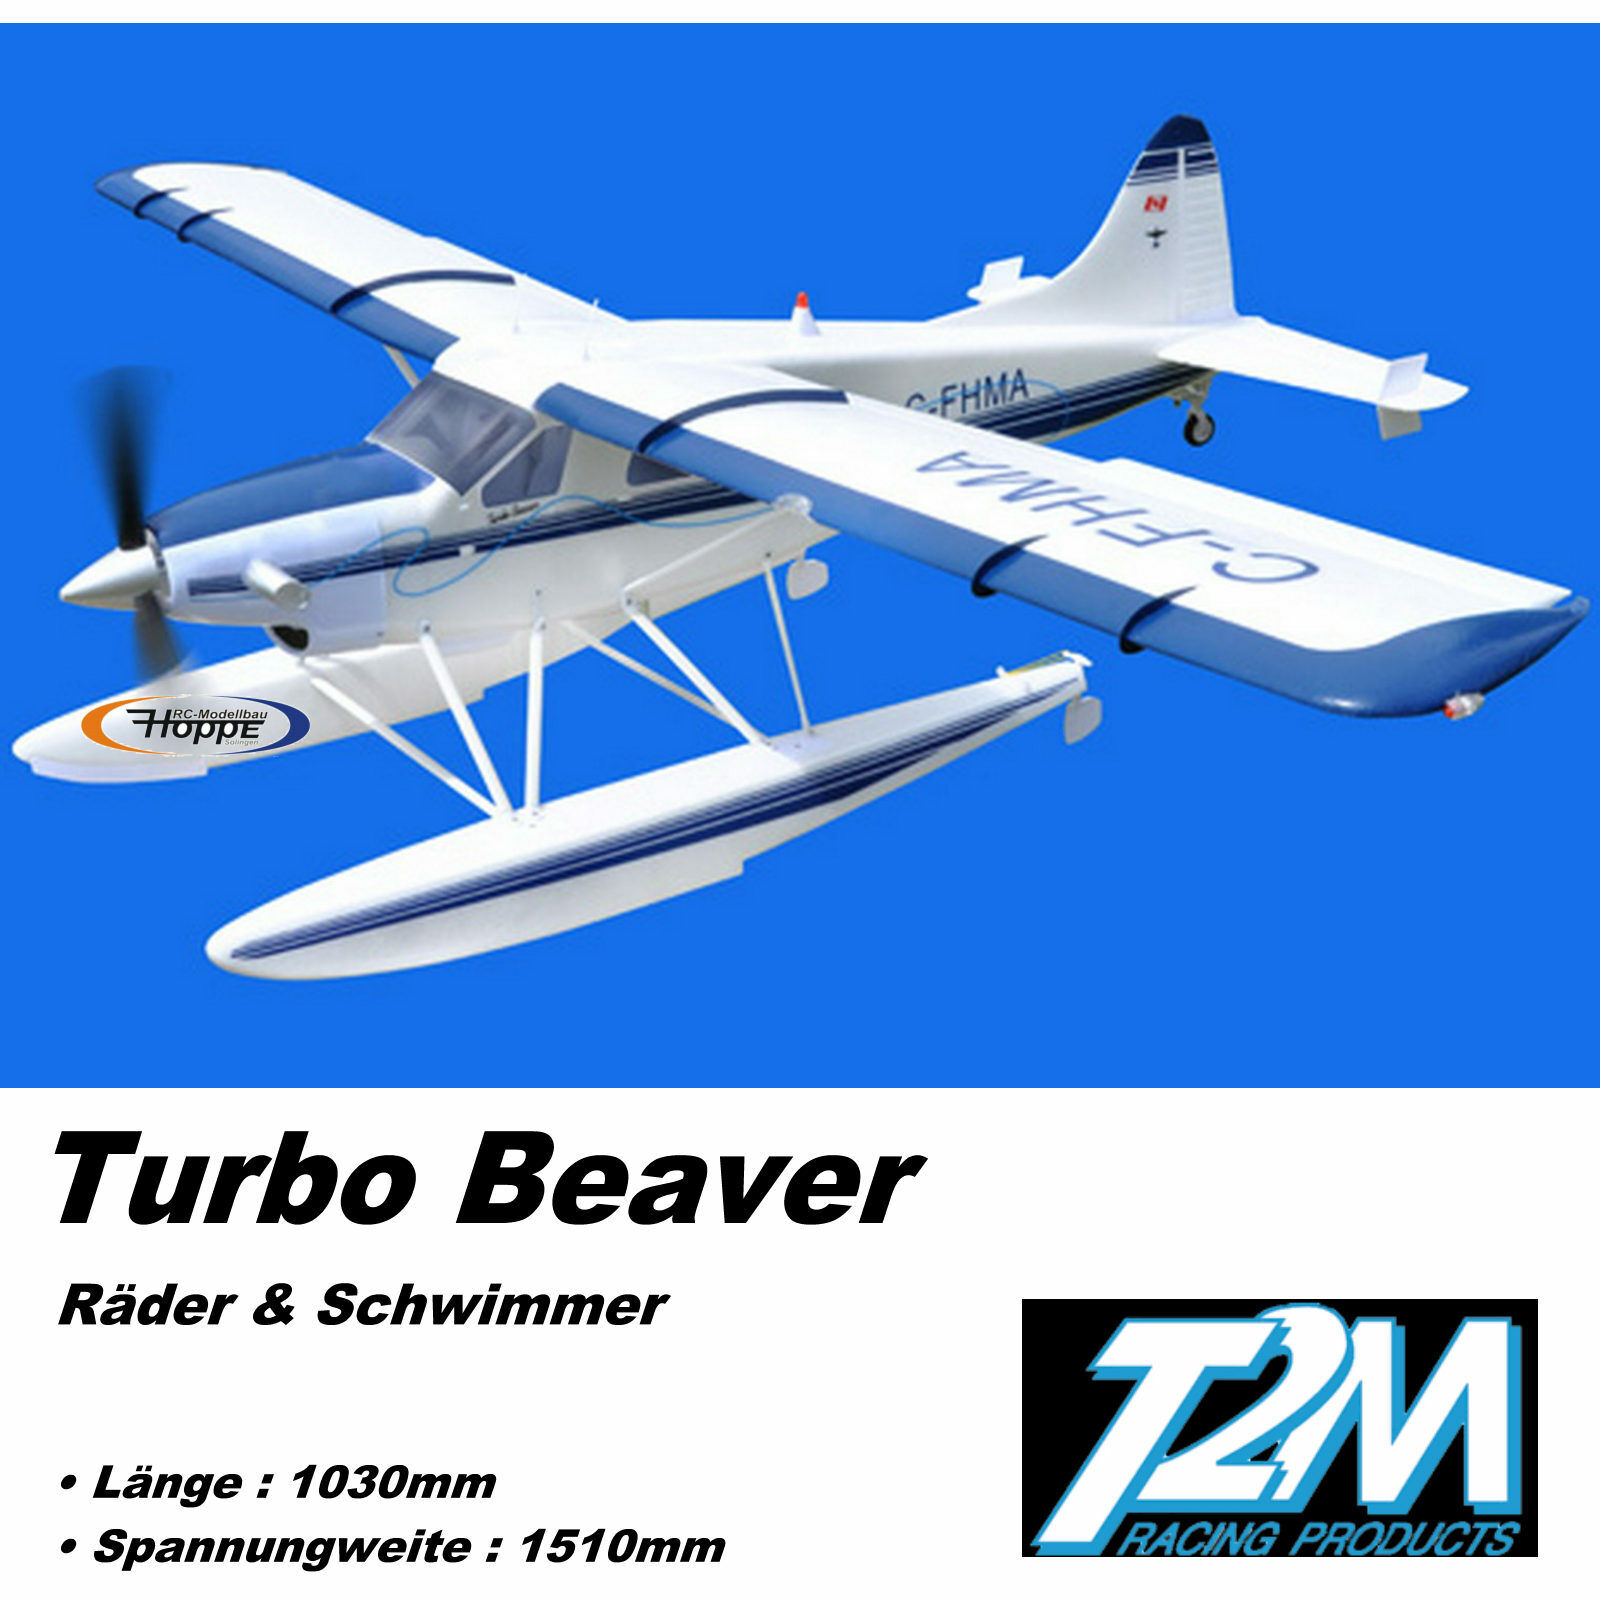 T2m Turbo Beaver Arf Brushless Transport Aeroplane Float Light T4516